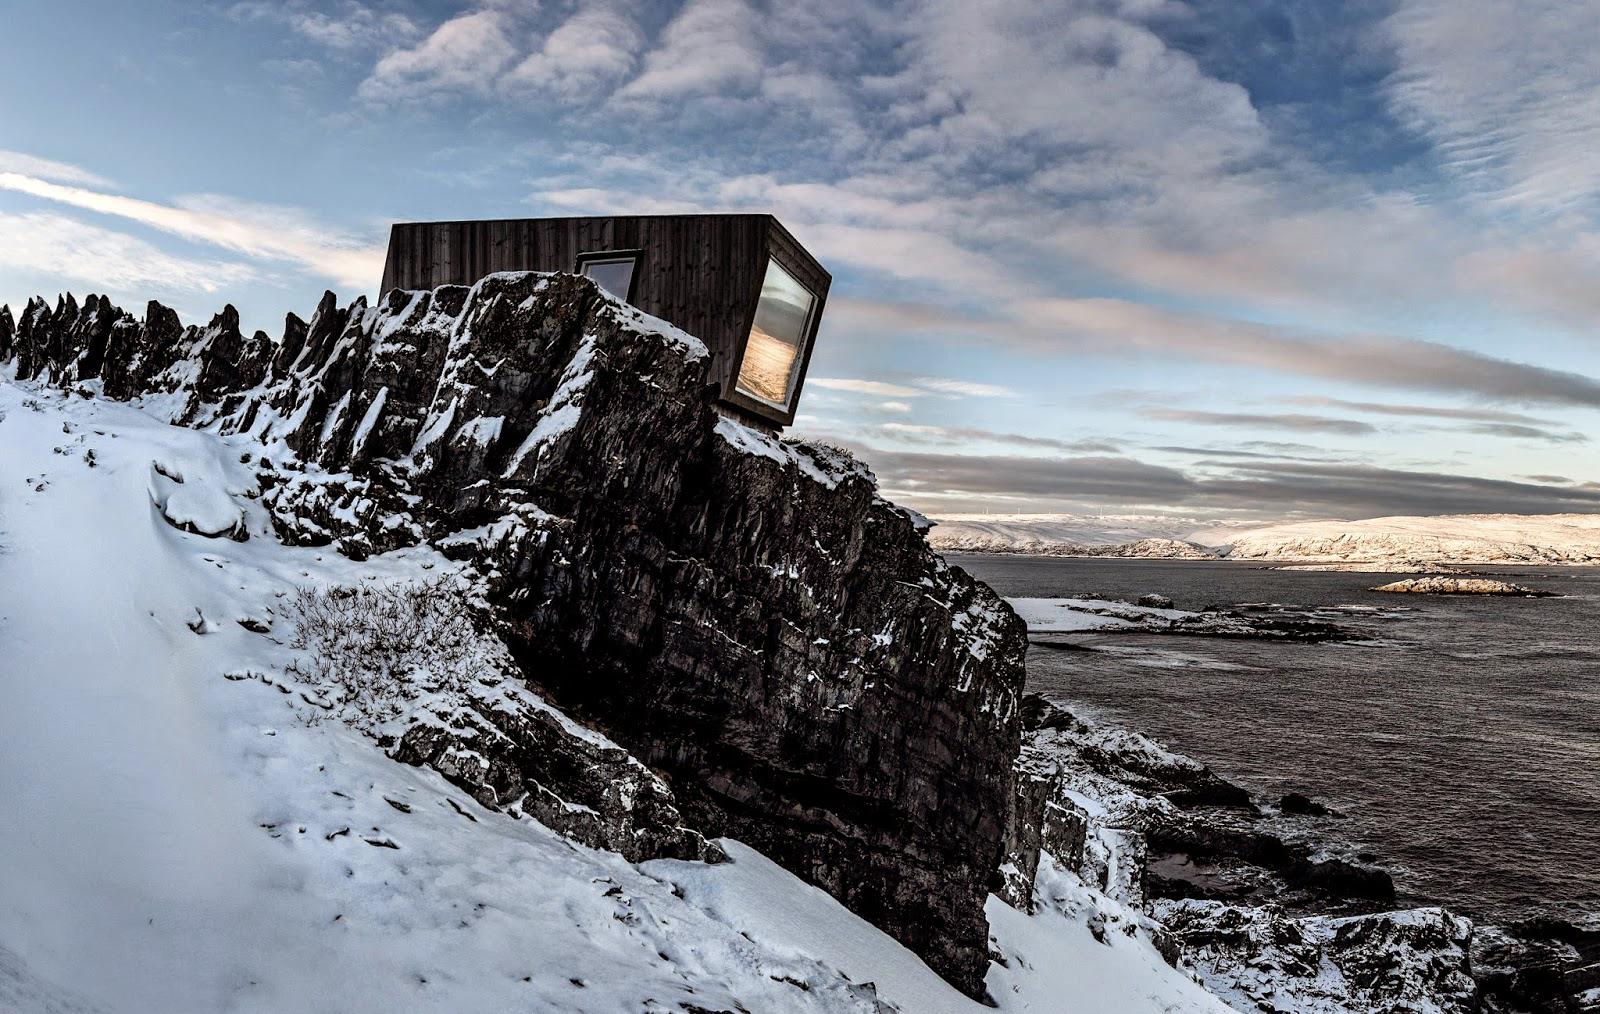 kongsfjord bird hide/wind shelter  northern varanger peninsula, arctic no   biotope